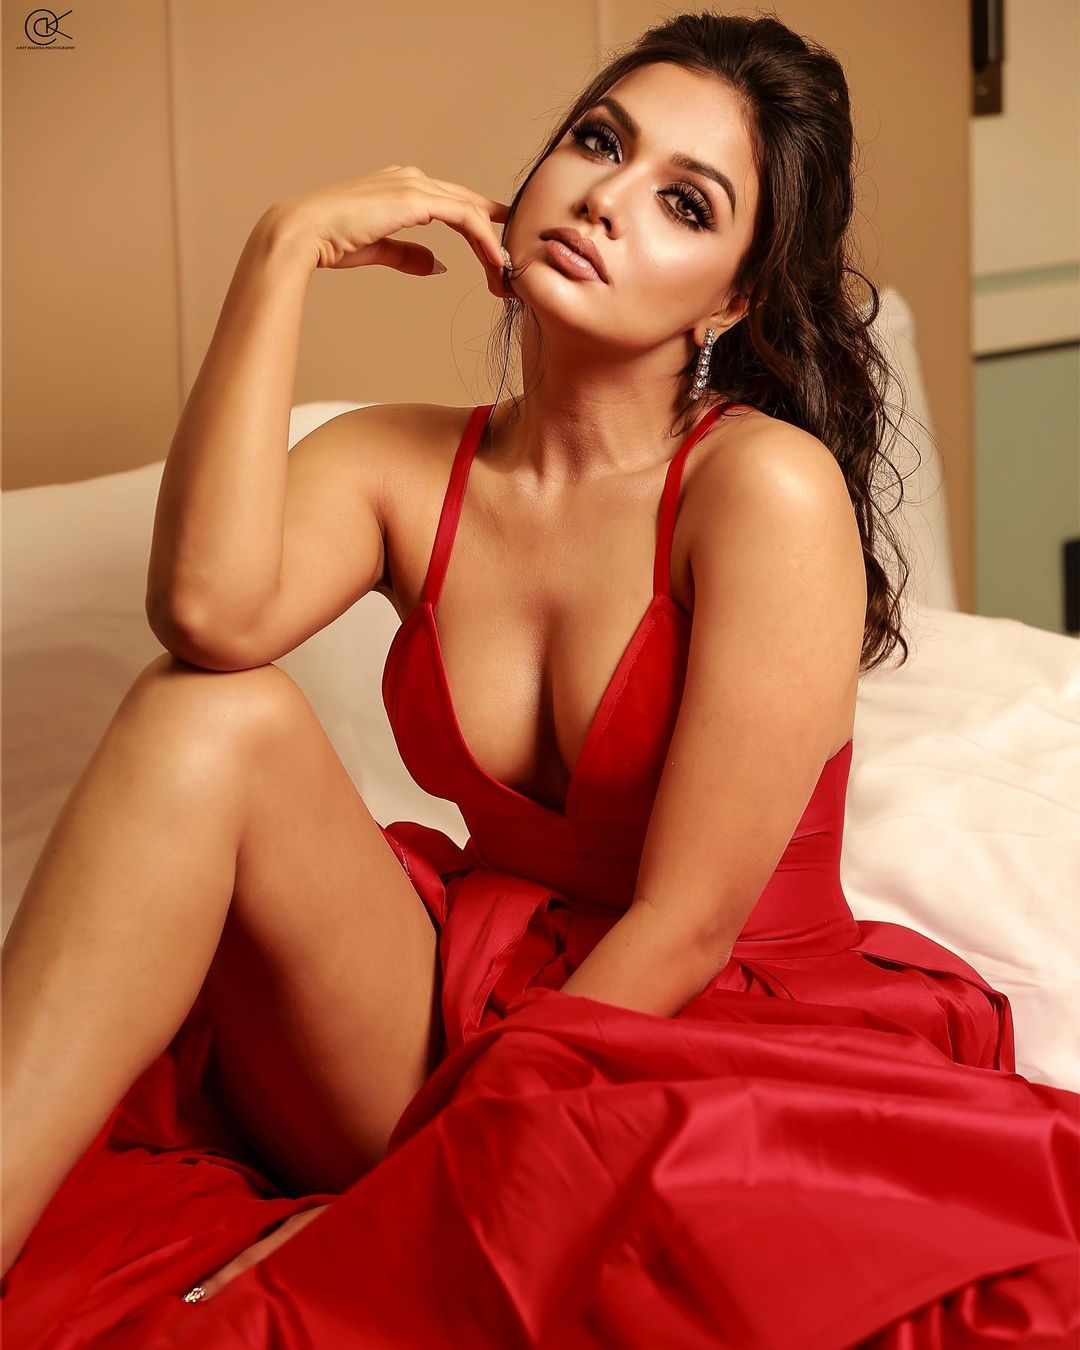 Divya Agarwal Relationship With Her Ex Priyank Sharma | दिव्या अग्रवाल की EX-BF प्रियांक से दोस्ती